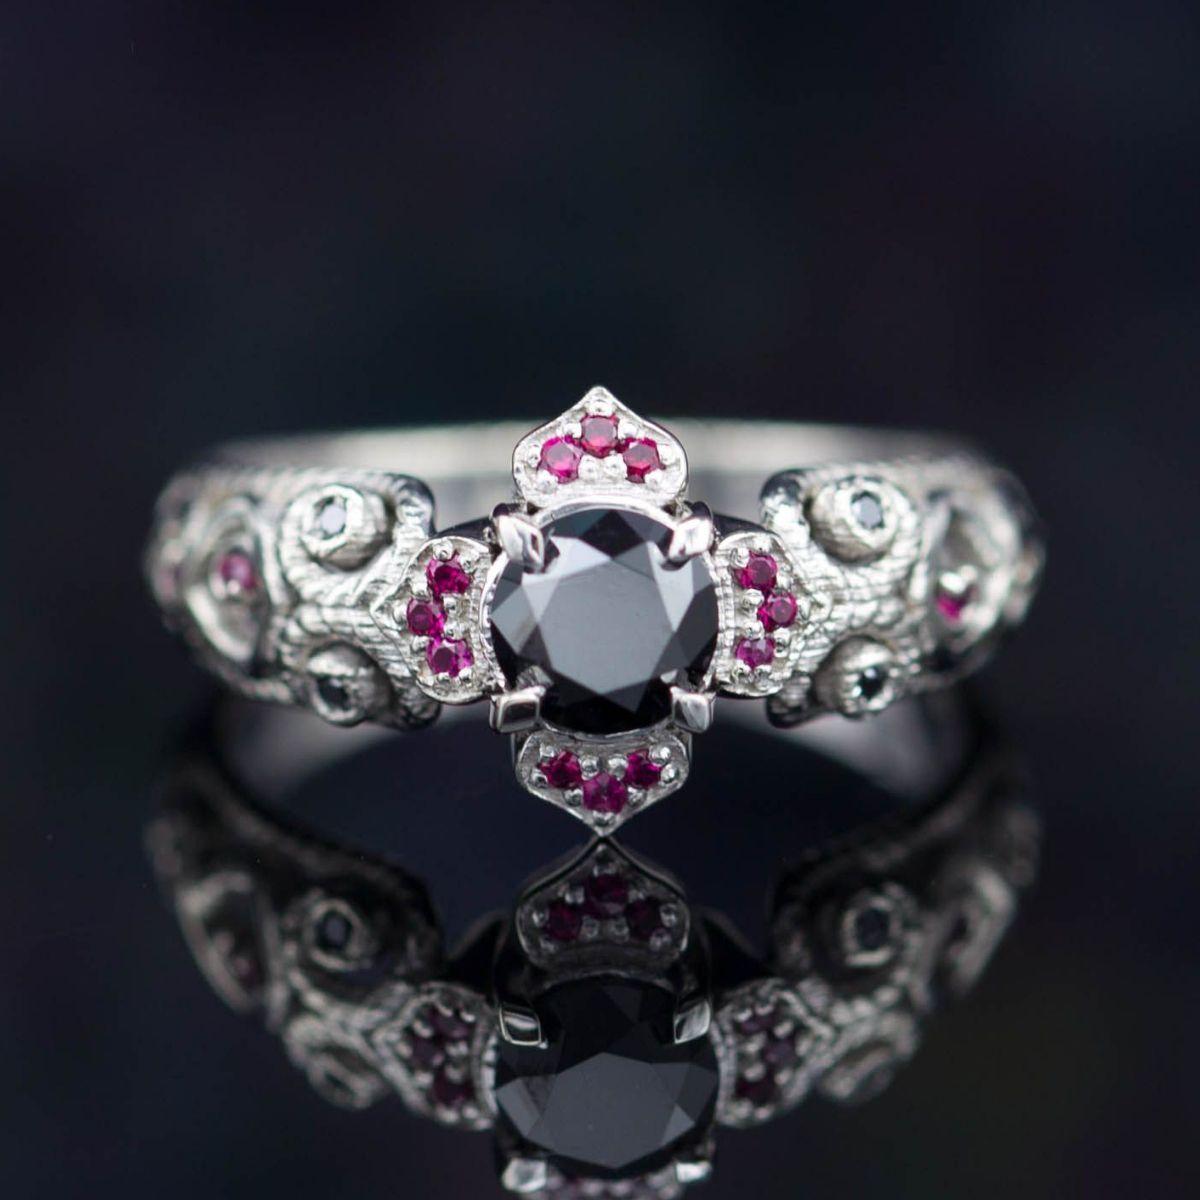 Black Diamond Engagement Rings | CustomMade.com